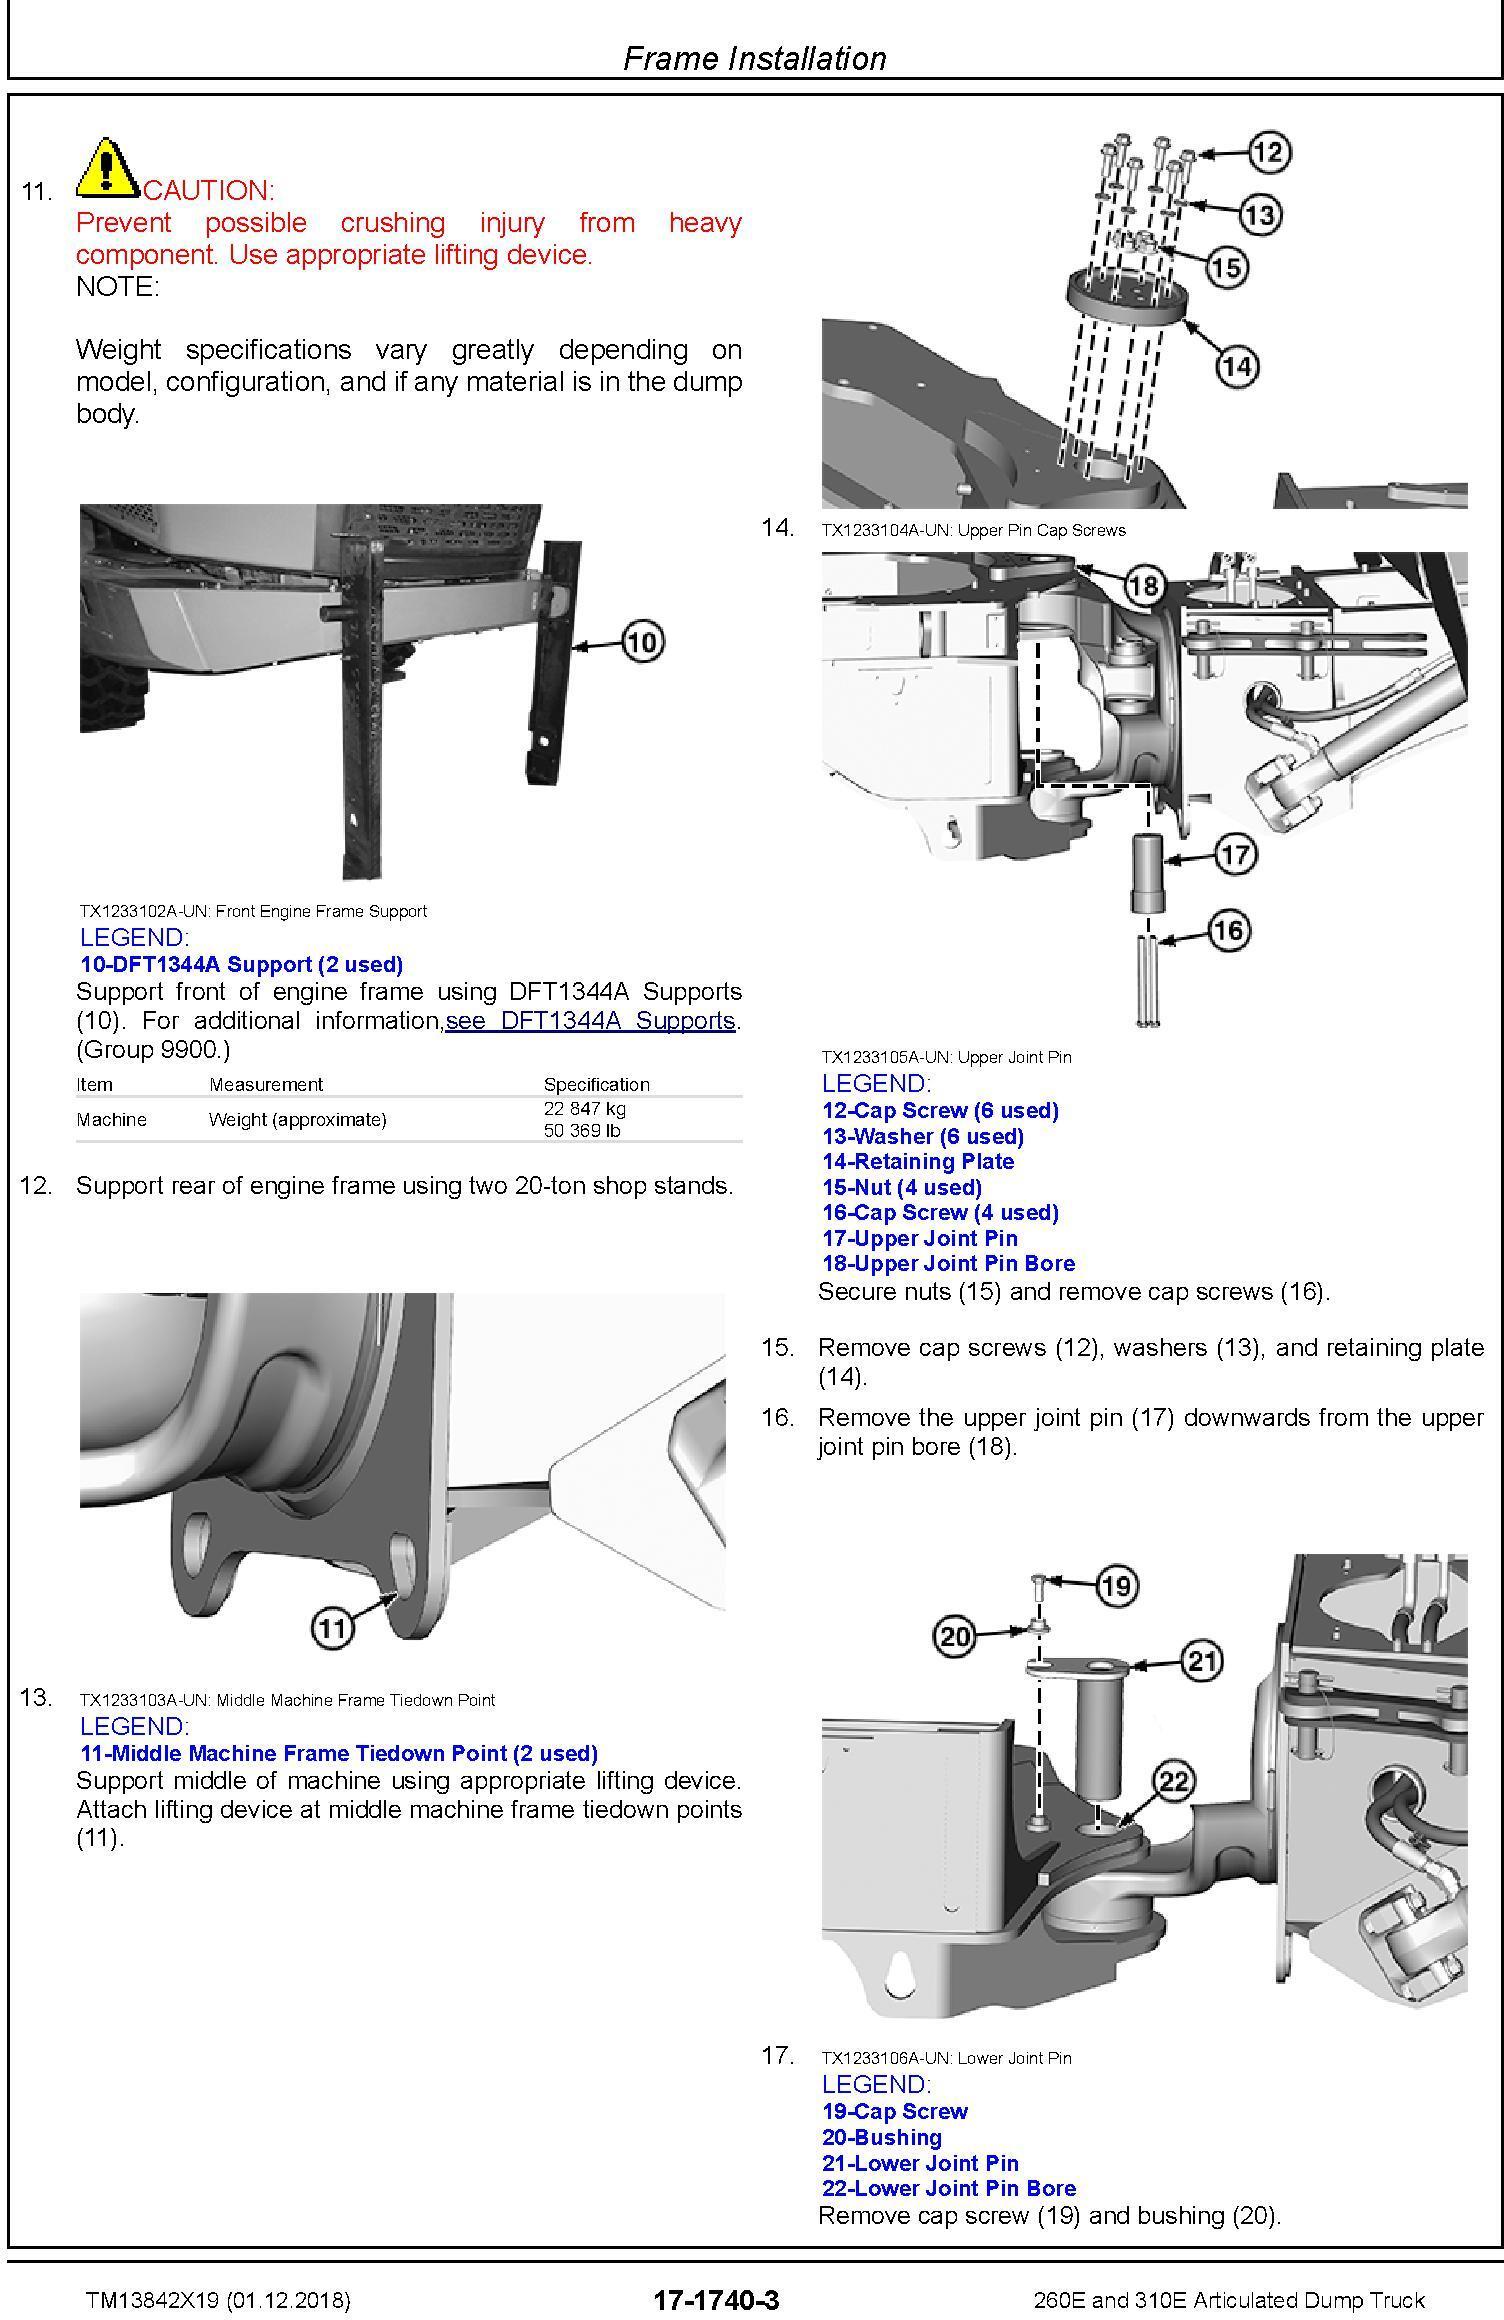 John Deere 260E, 310E Articulated Dump Truck (SN.F677827-) Repair Technical Manual (TM13842X19) - 3